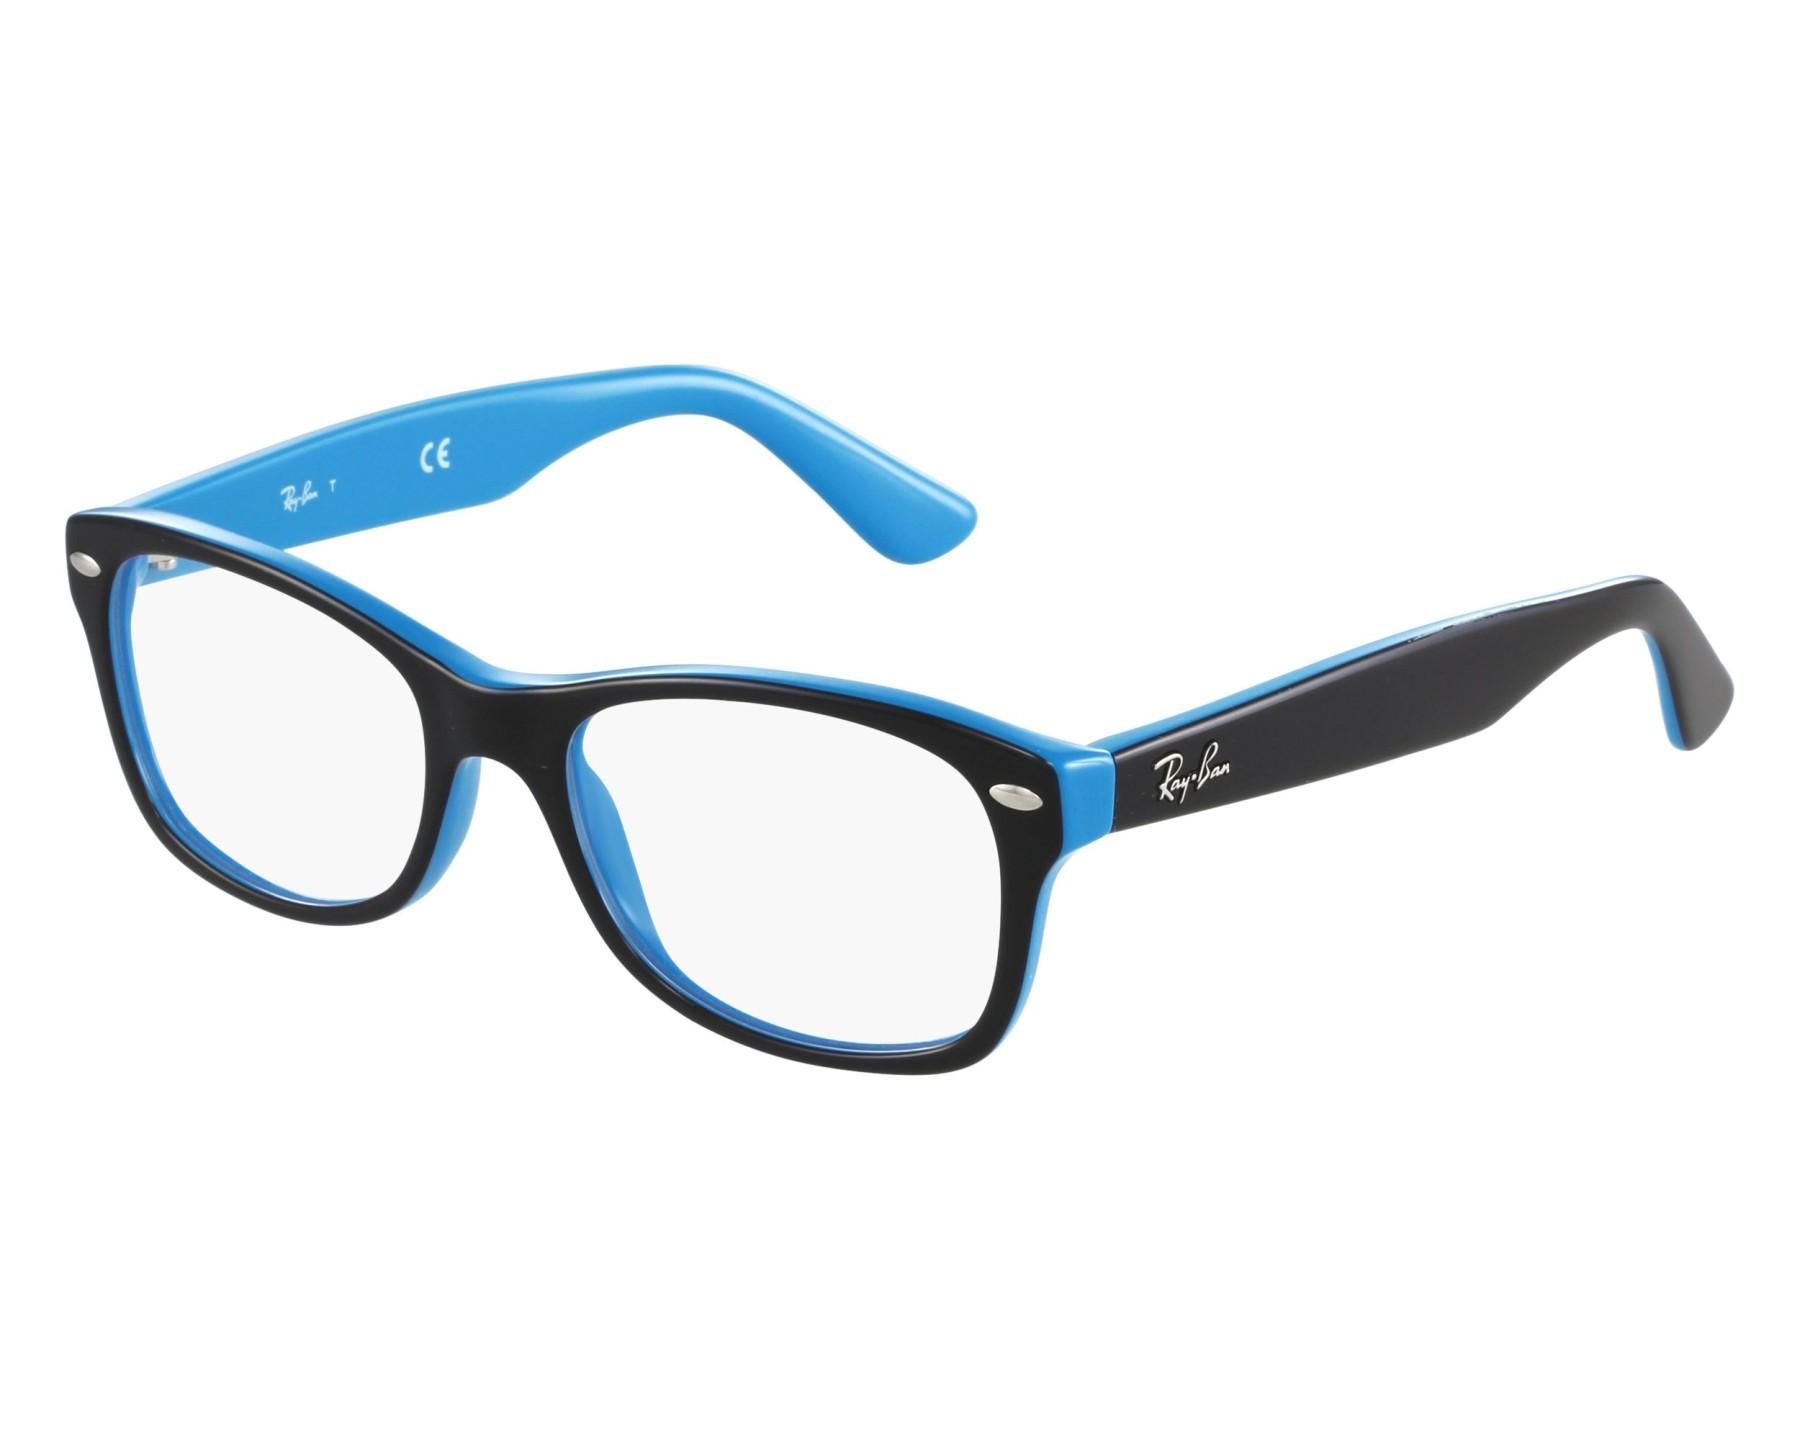 d47b4a2a76 eyeglasses Ray-Ban RY-1528 3659 - Black Blue front view